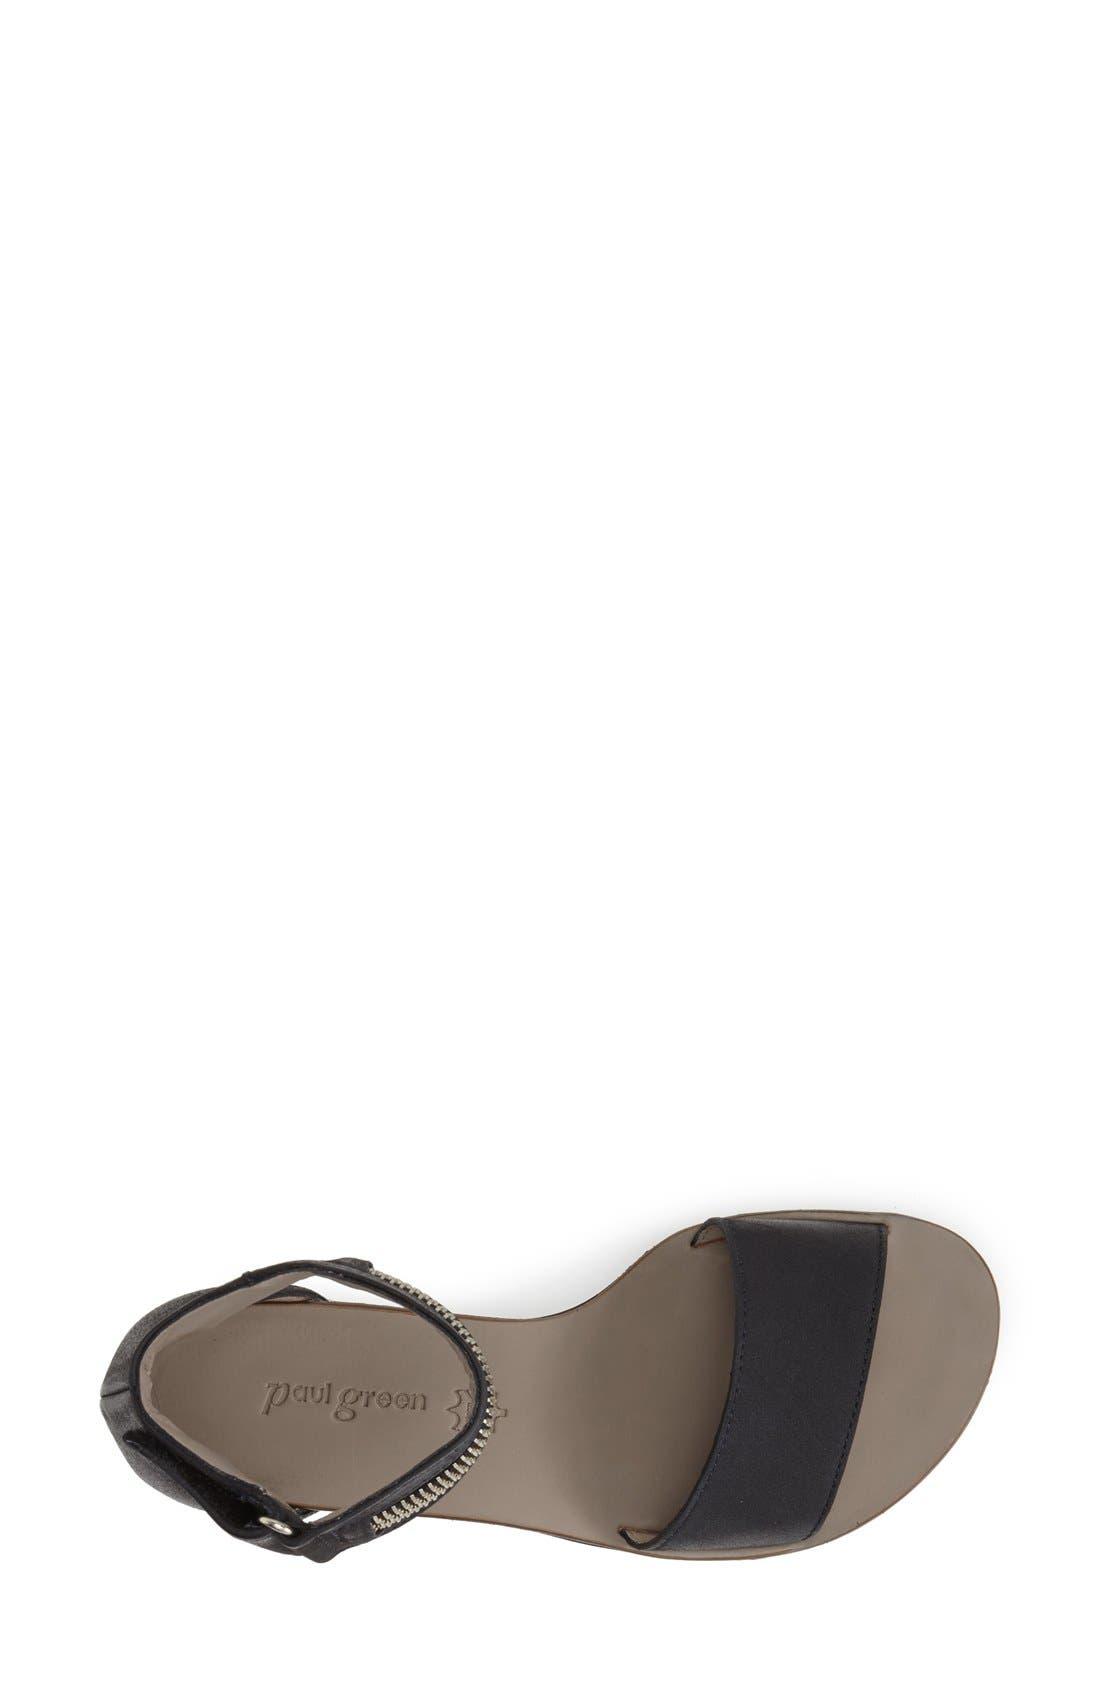 Alternate Image 3  - Paul Green 'Cotie' Ankle Strap Flat Sandal (Women)